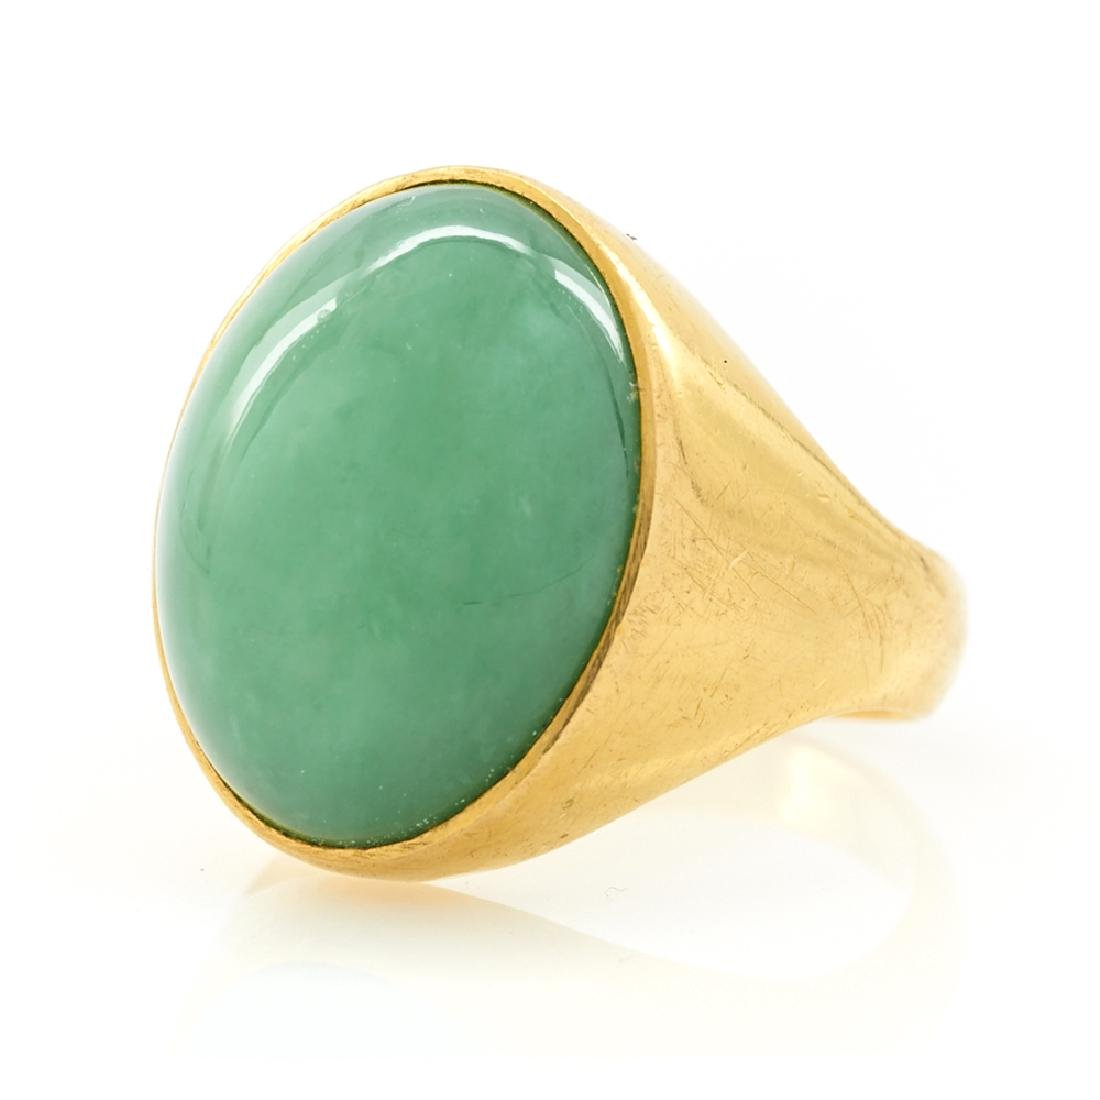 22k Yellow gold jade ring.